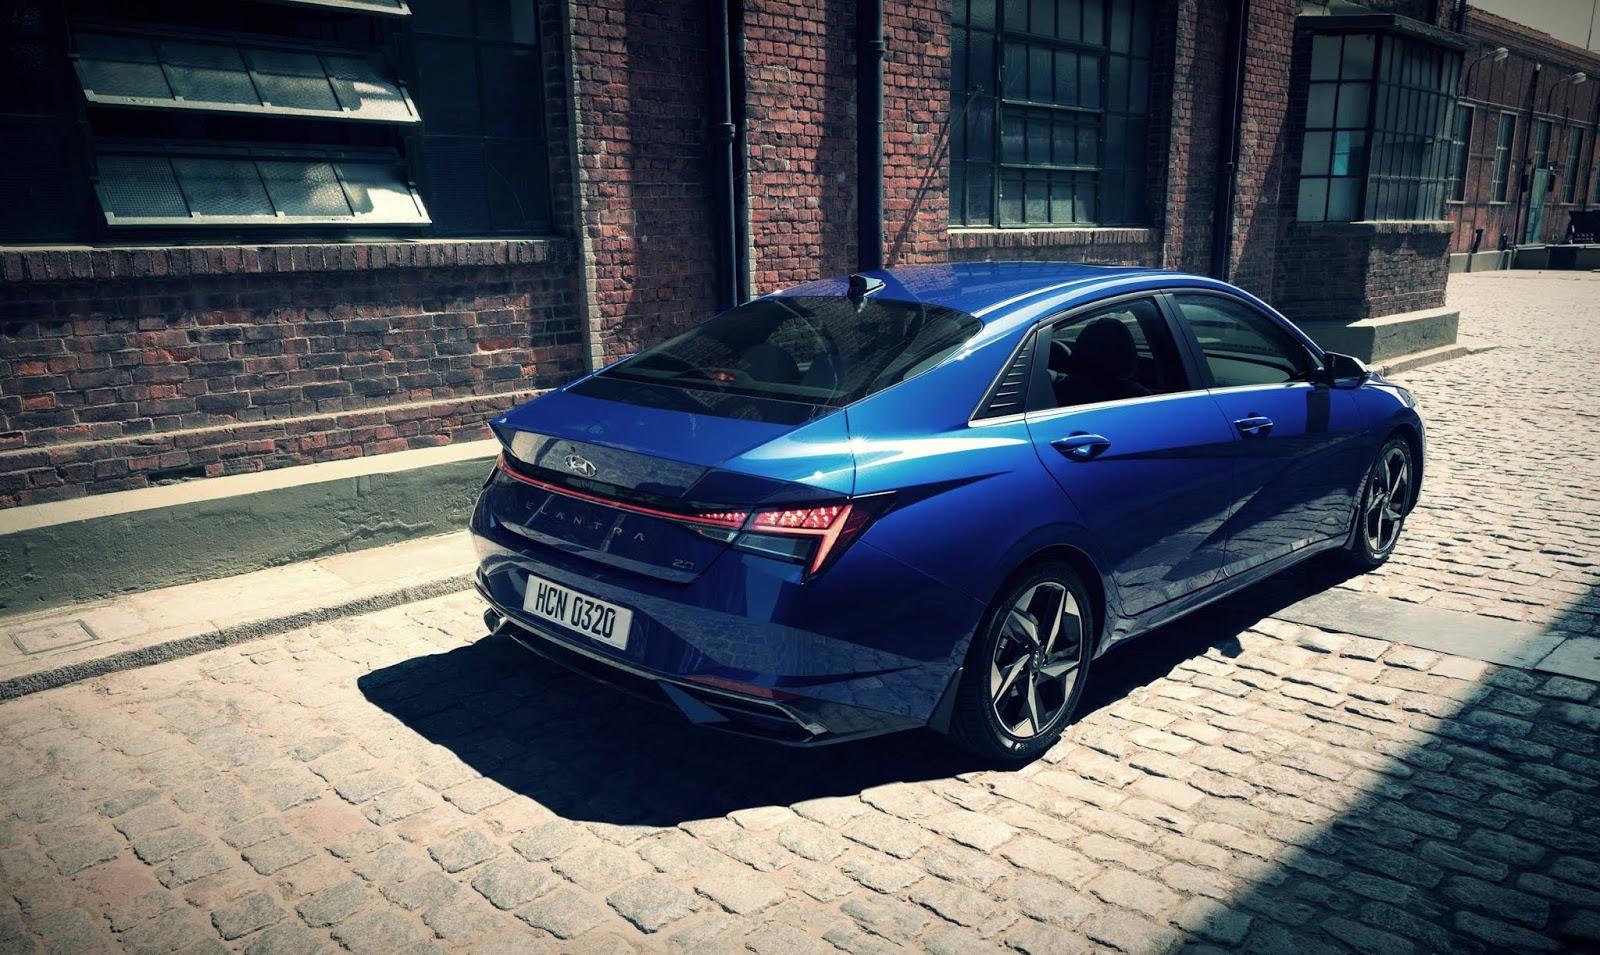 Hyundai Motor Company Introduced the new Hyundai Elantra: